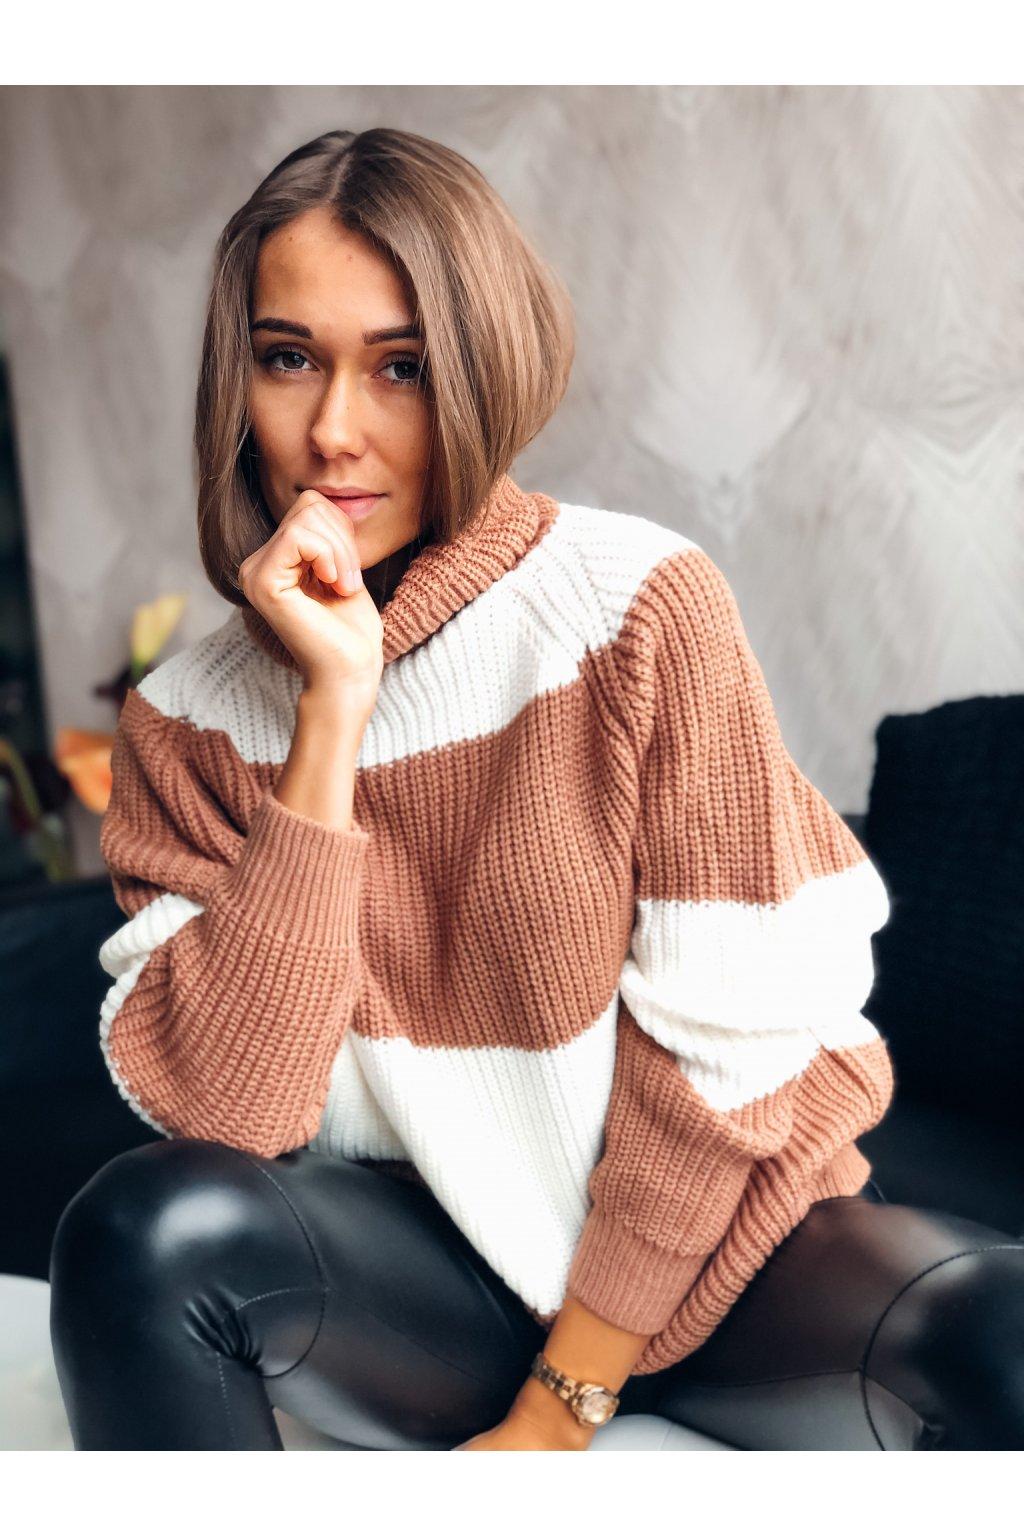 damsky rolakovy svetr stripe caramel eshopat cz 1